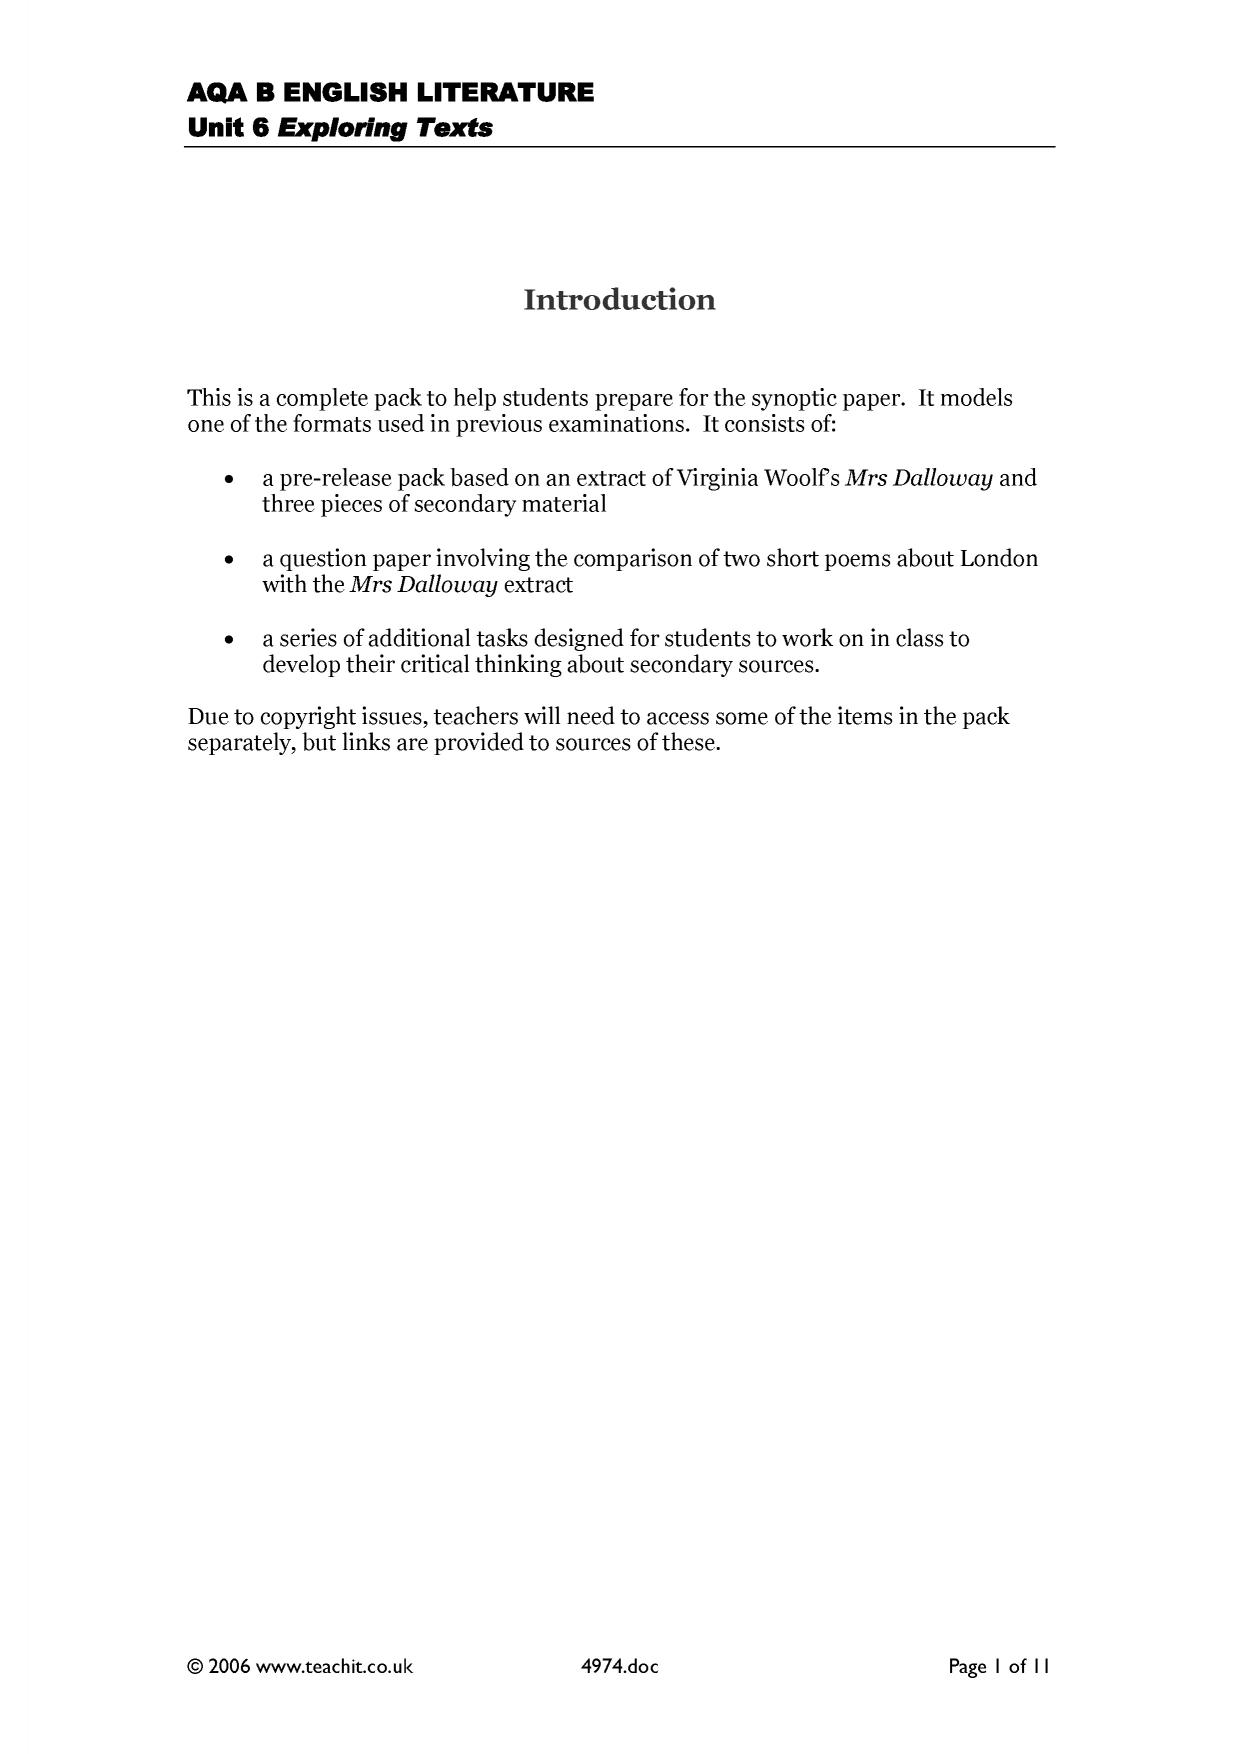 idiolect essay aqa Aqa spoken language aqa gcse english literature 2015 paper 1: shakespeare and the 19th century novel  idiolect – 'the language use of a single individual.